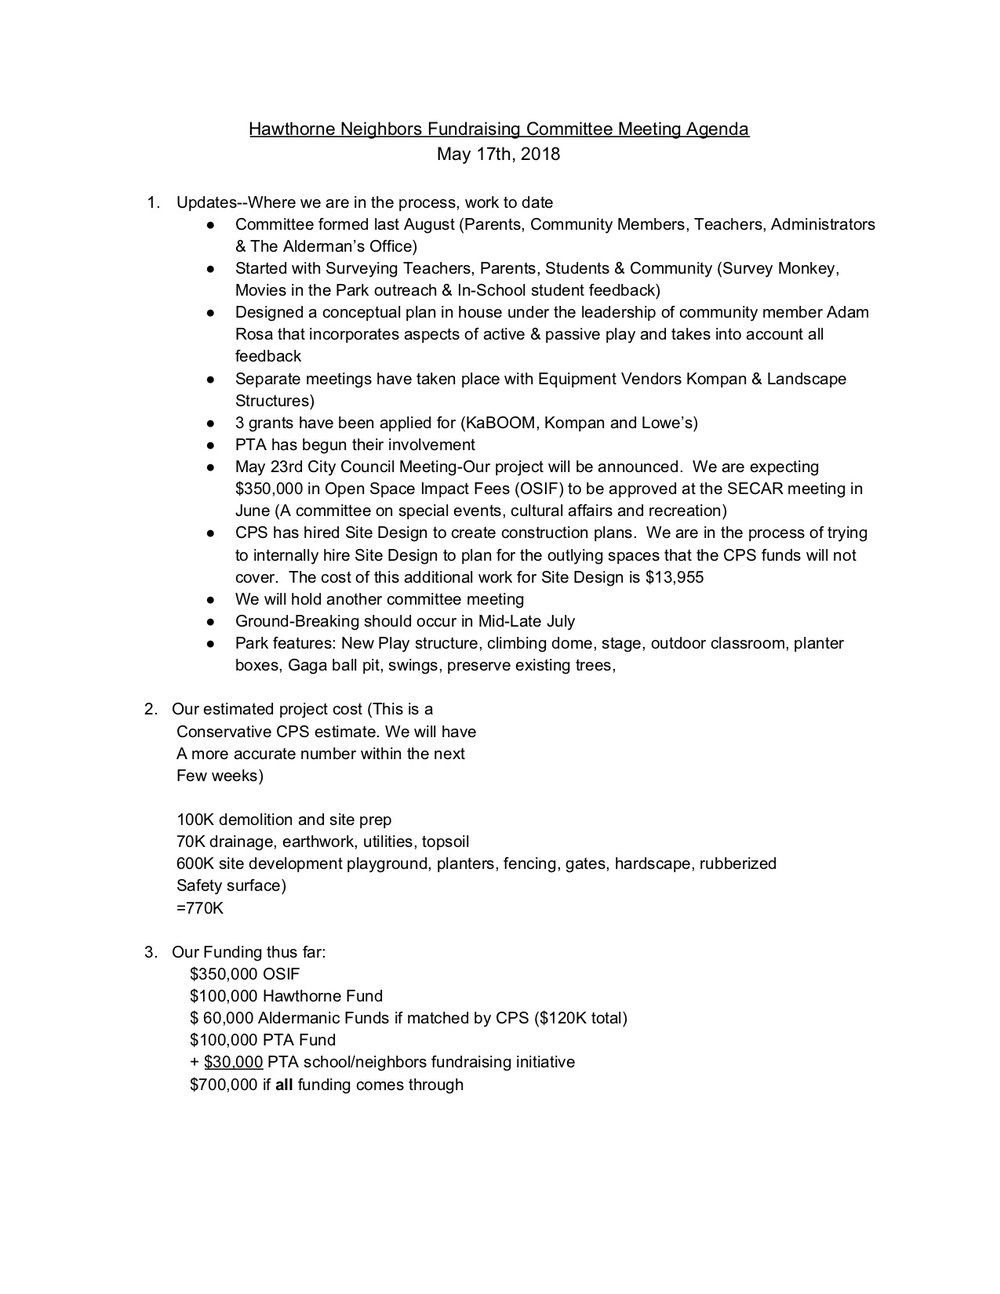 Hawthorne Neighbors Fundraising Committee Meeting Agenda (2).jpg